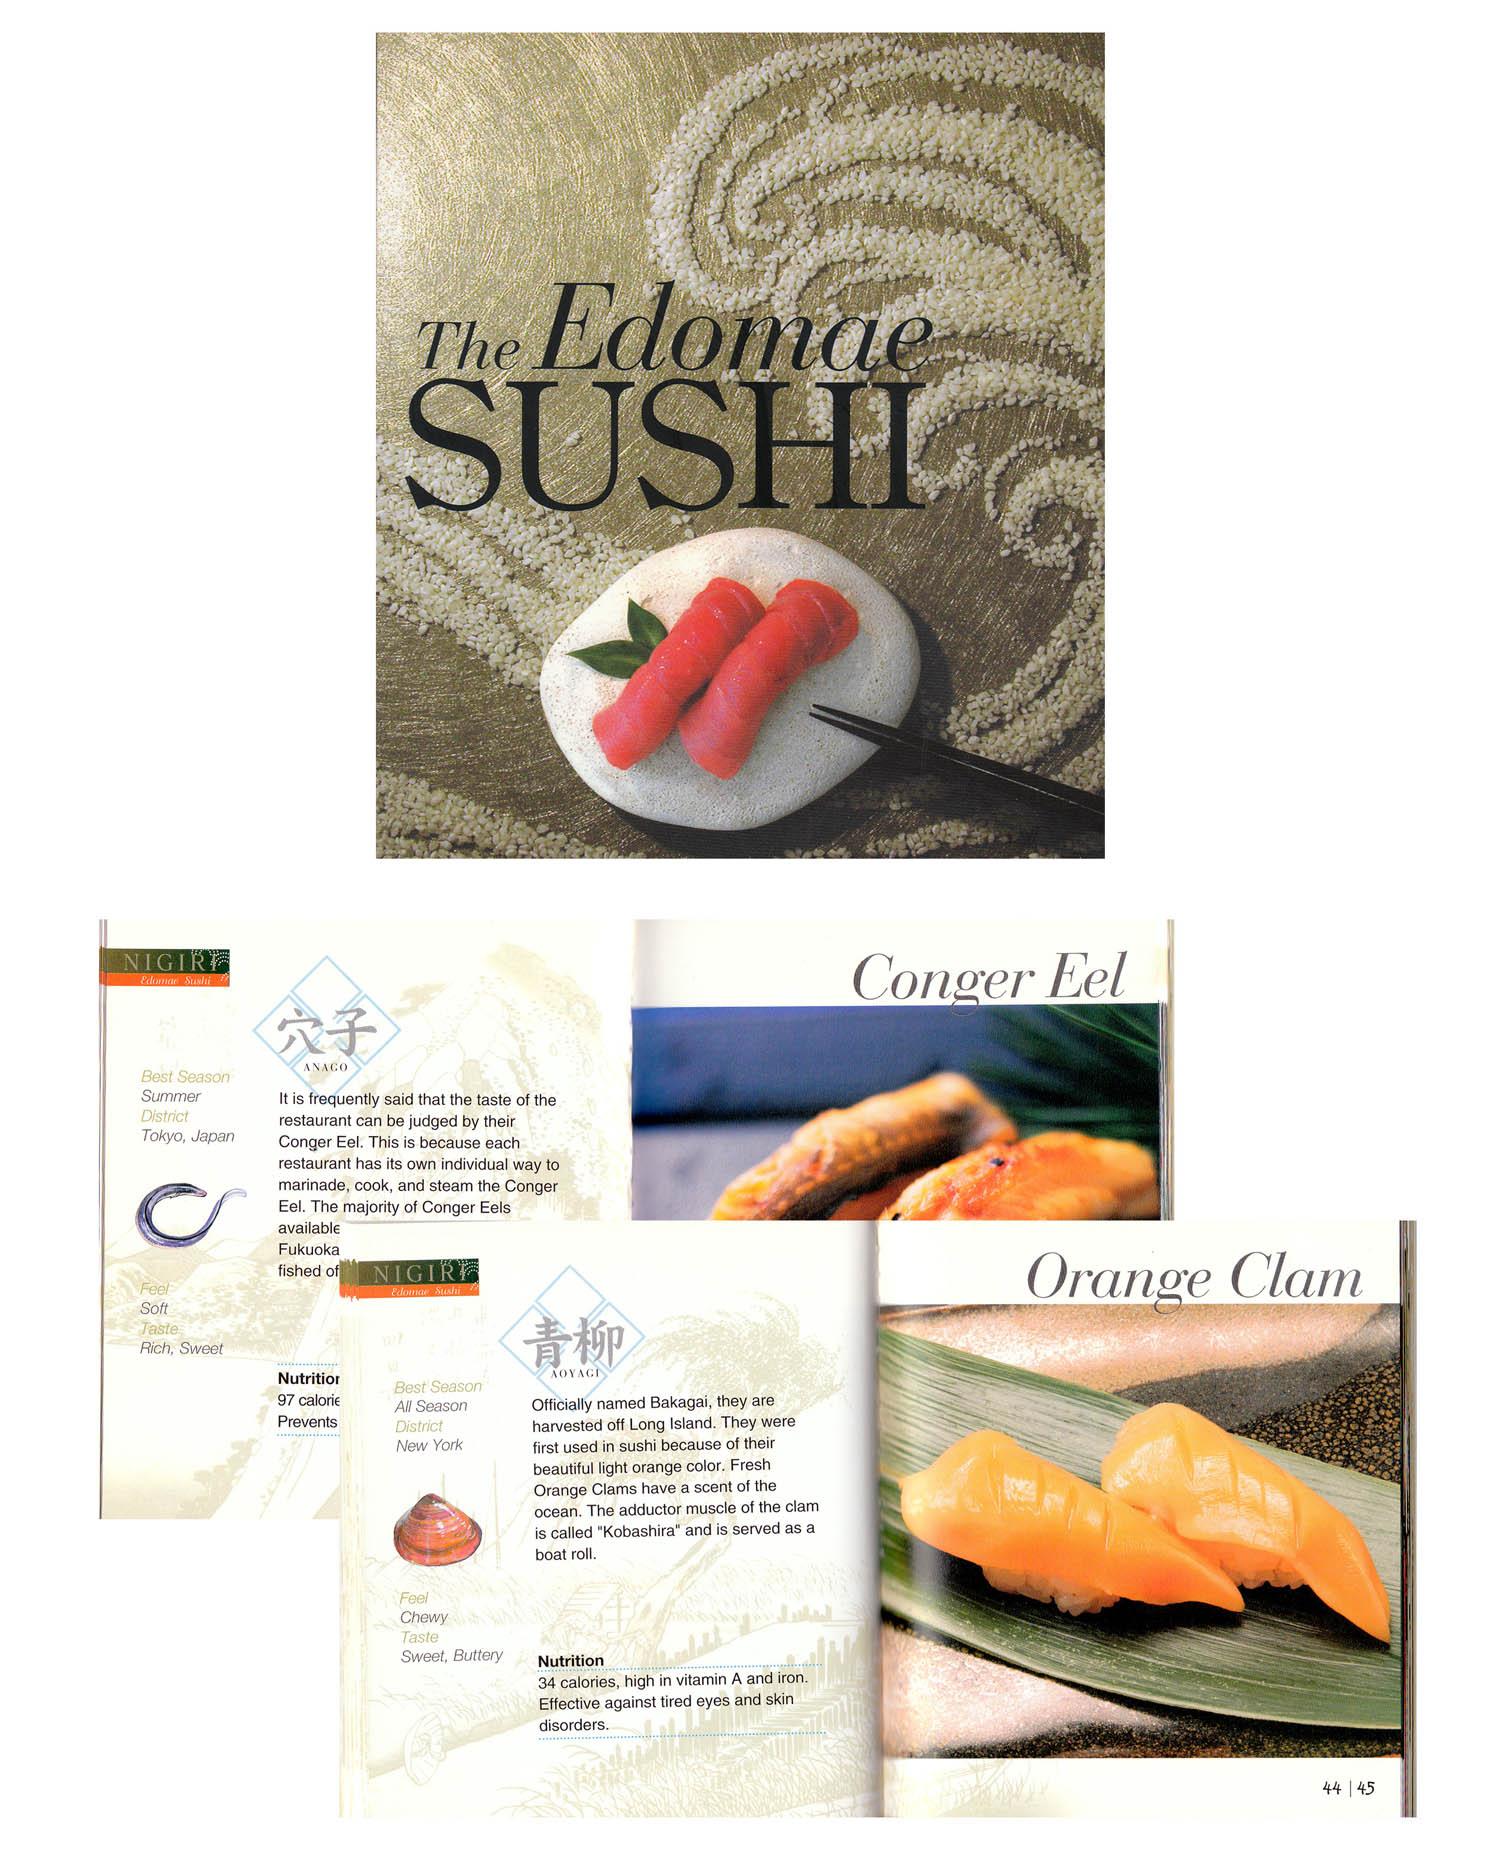 edomae-sushi-web.jpg